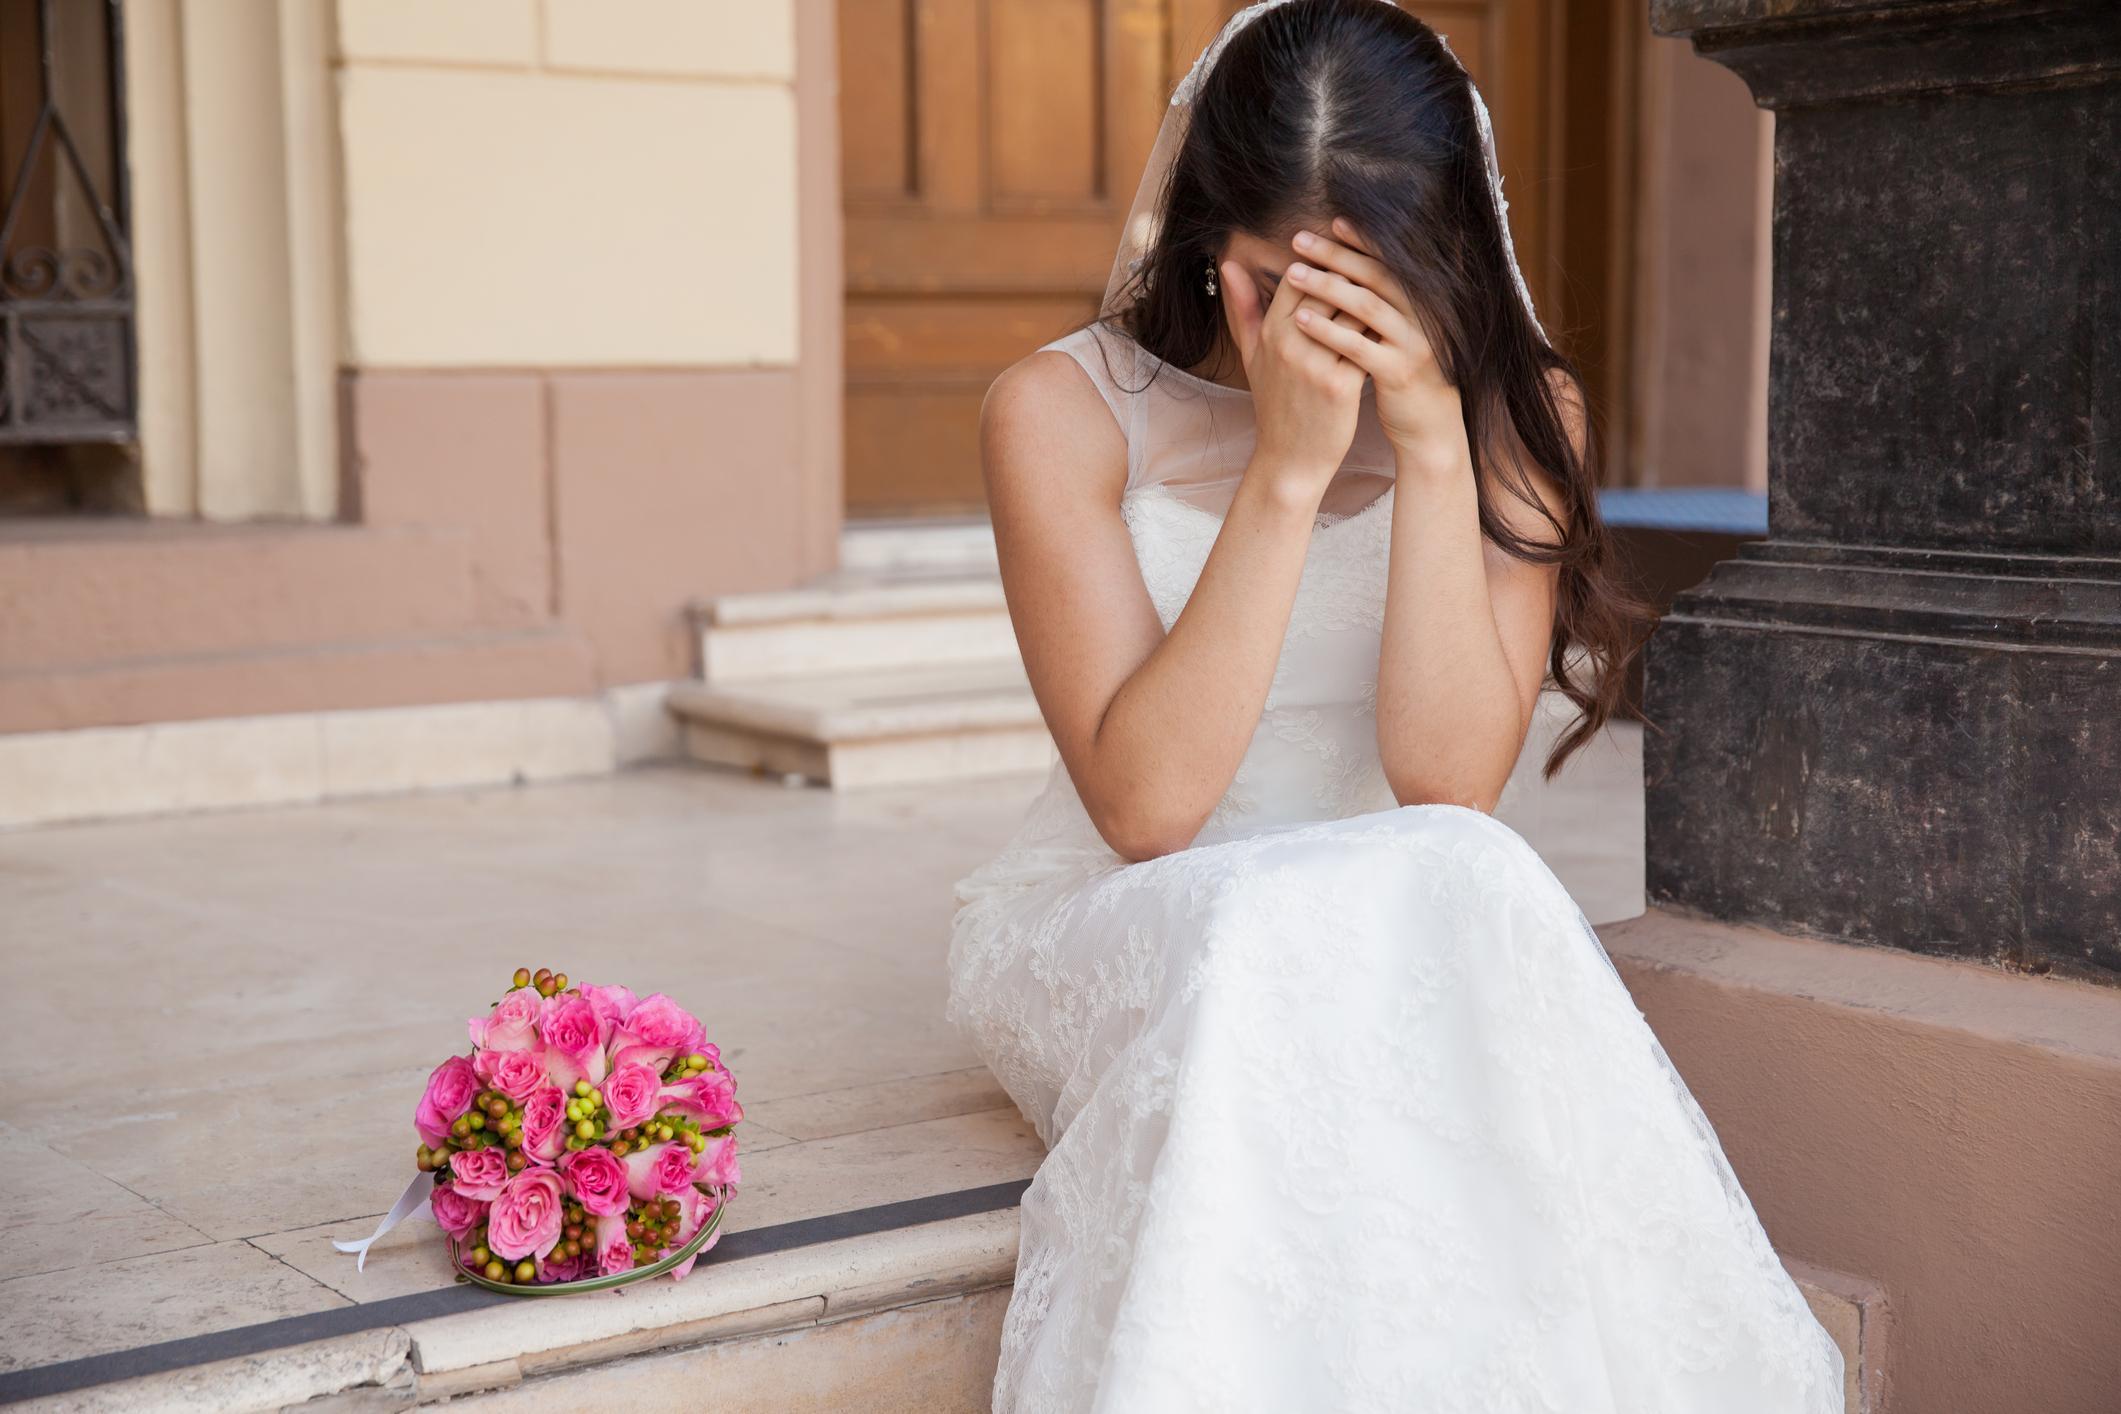 5-runaway-brides-1565808118179.jpg